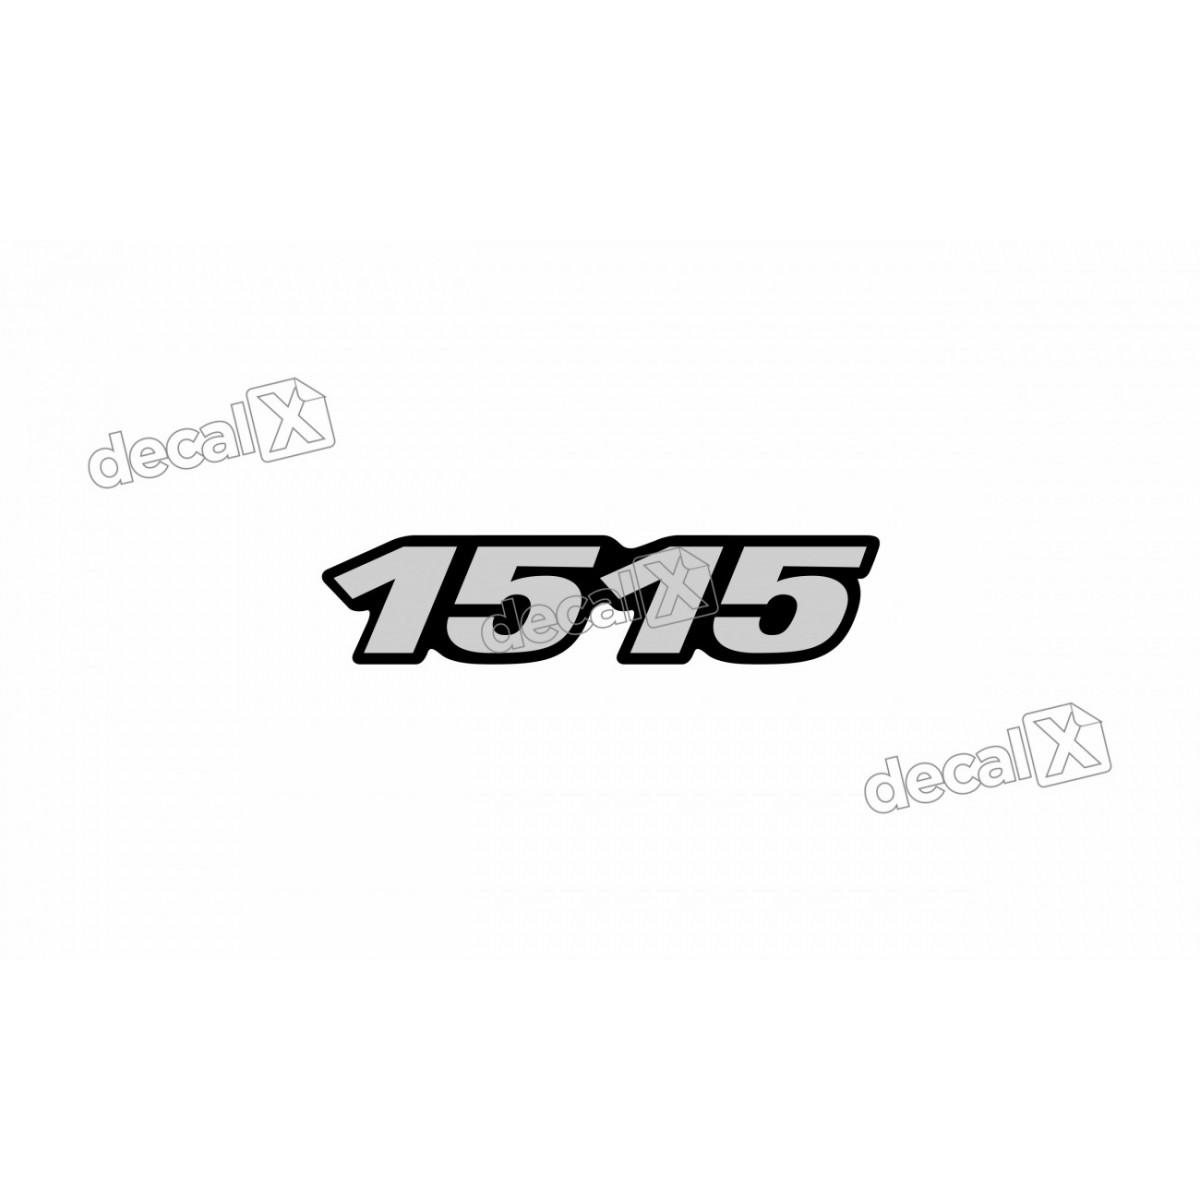 Adesivo Emblema Resinado Mercedes 1515 Cm34 Decalx